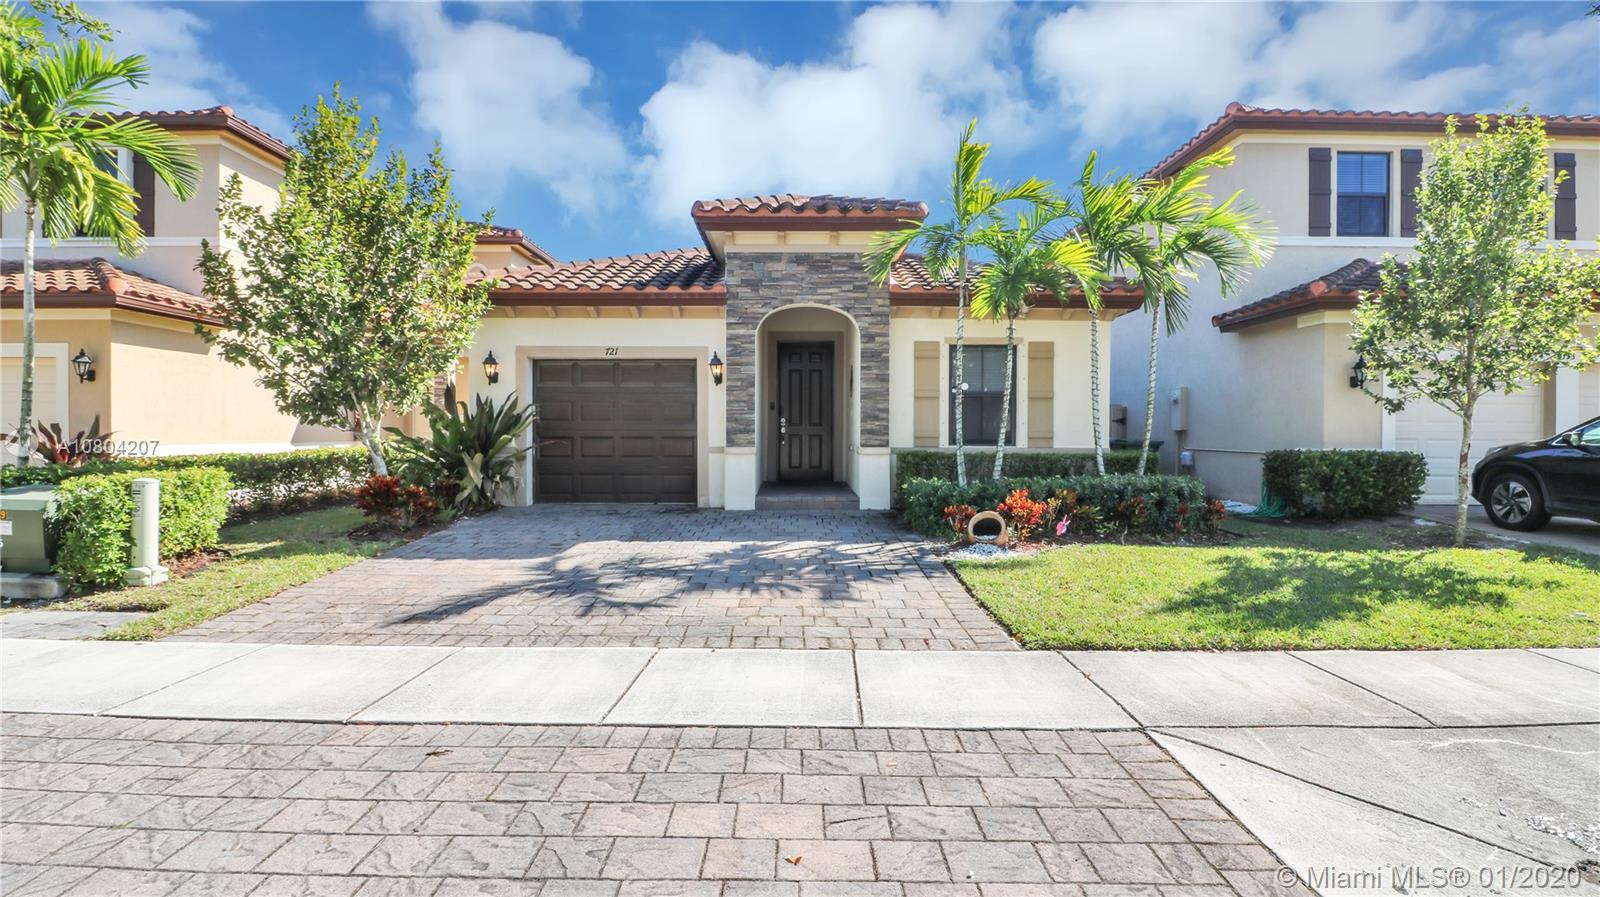 721 SE 33rd Ter, Homestead, FL 33033 - Homestead, FL real estate listing